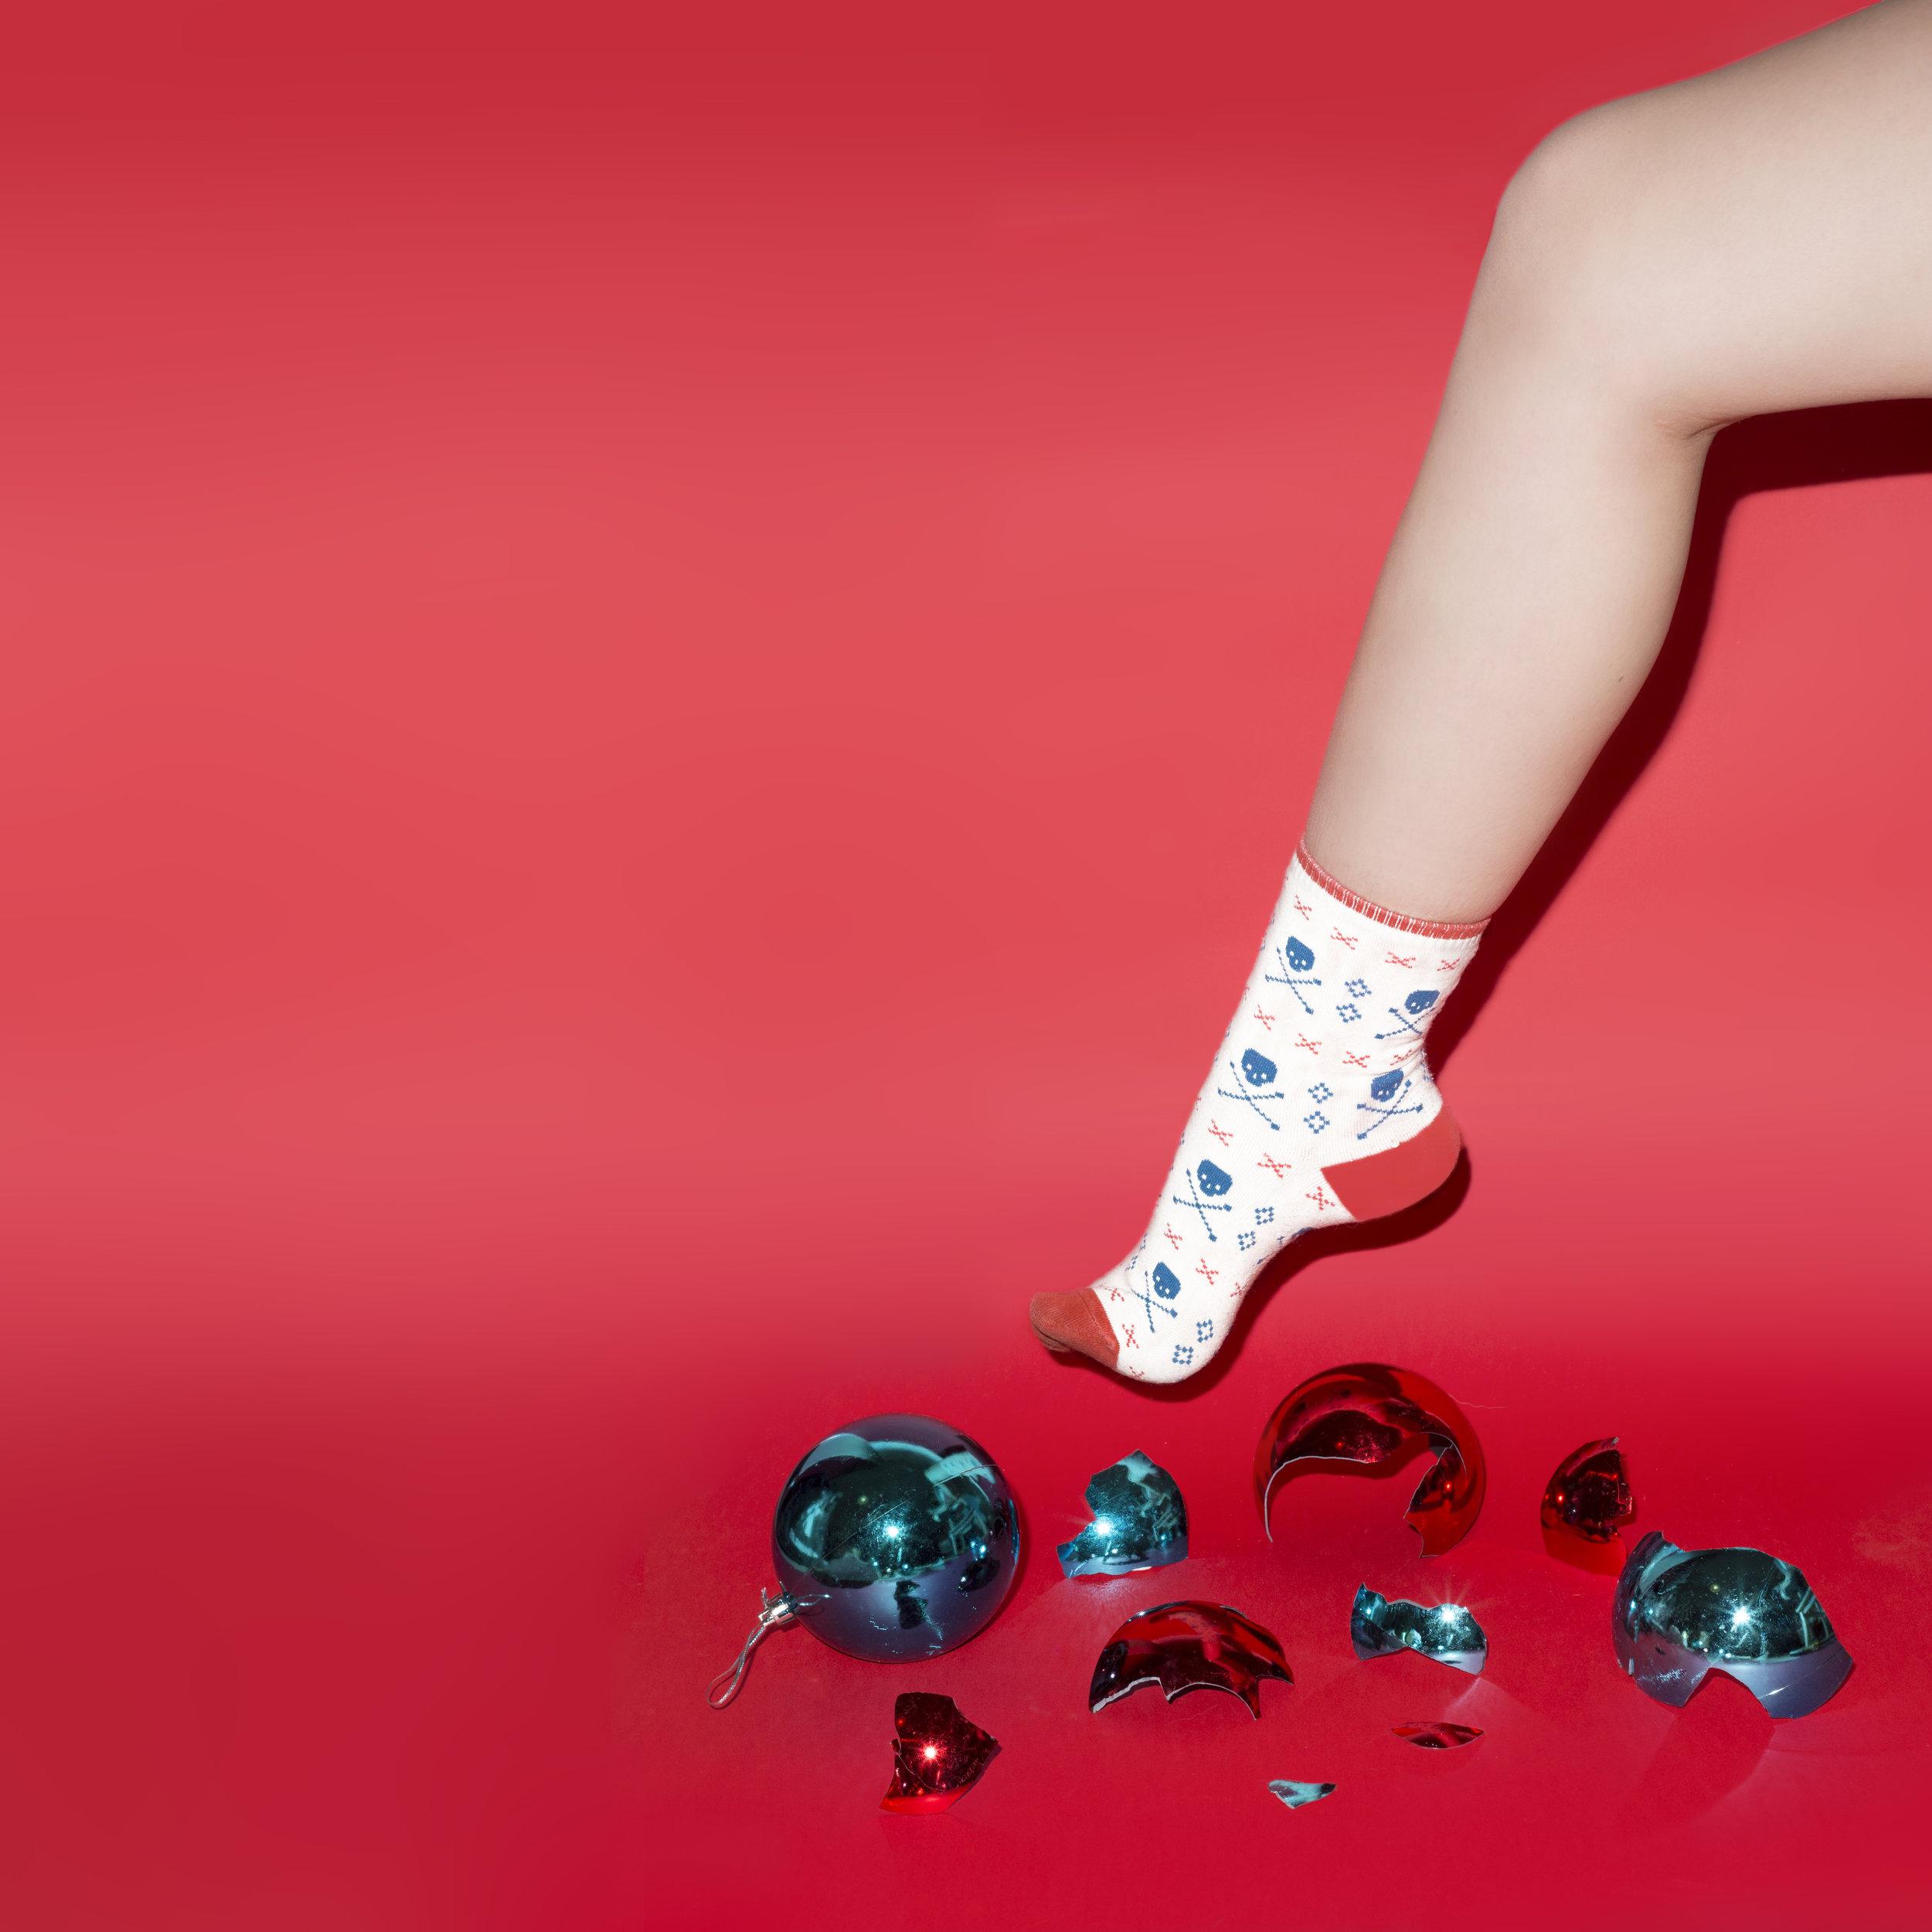 December 4th - Socks Day